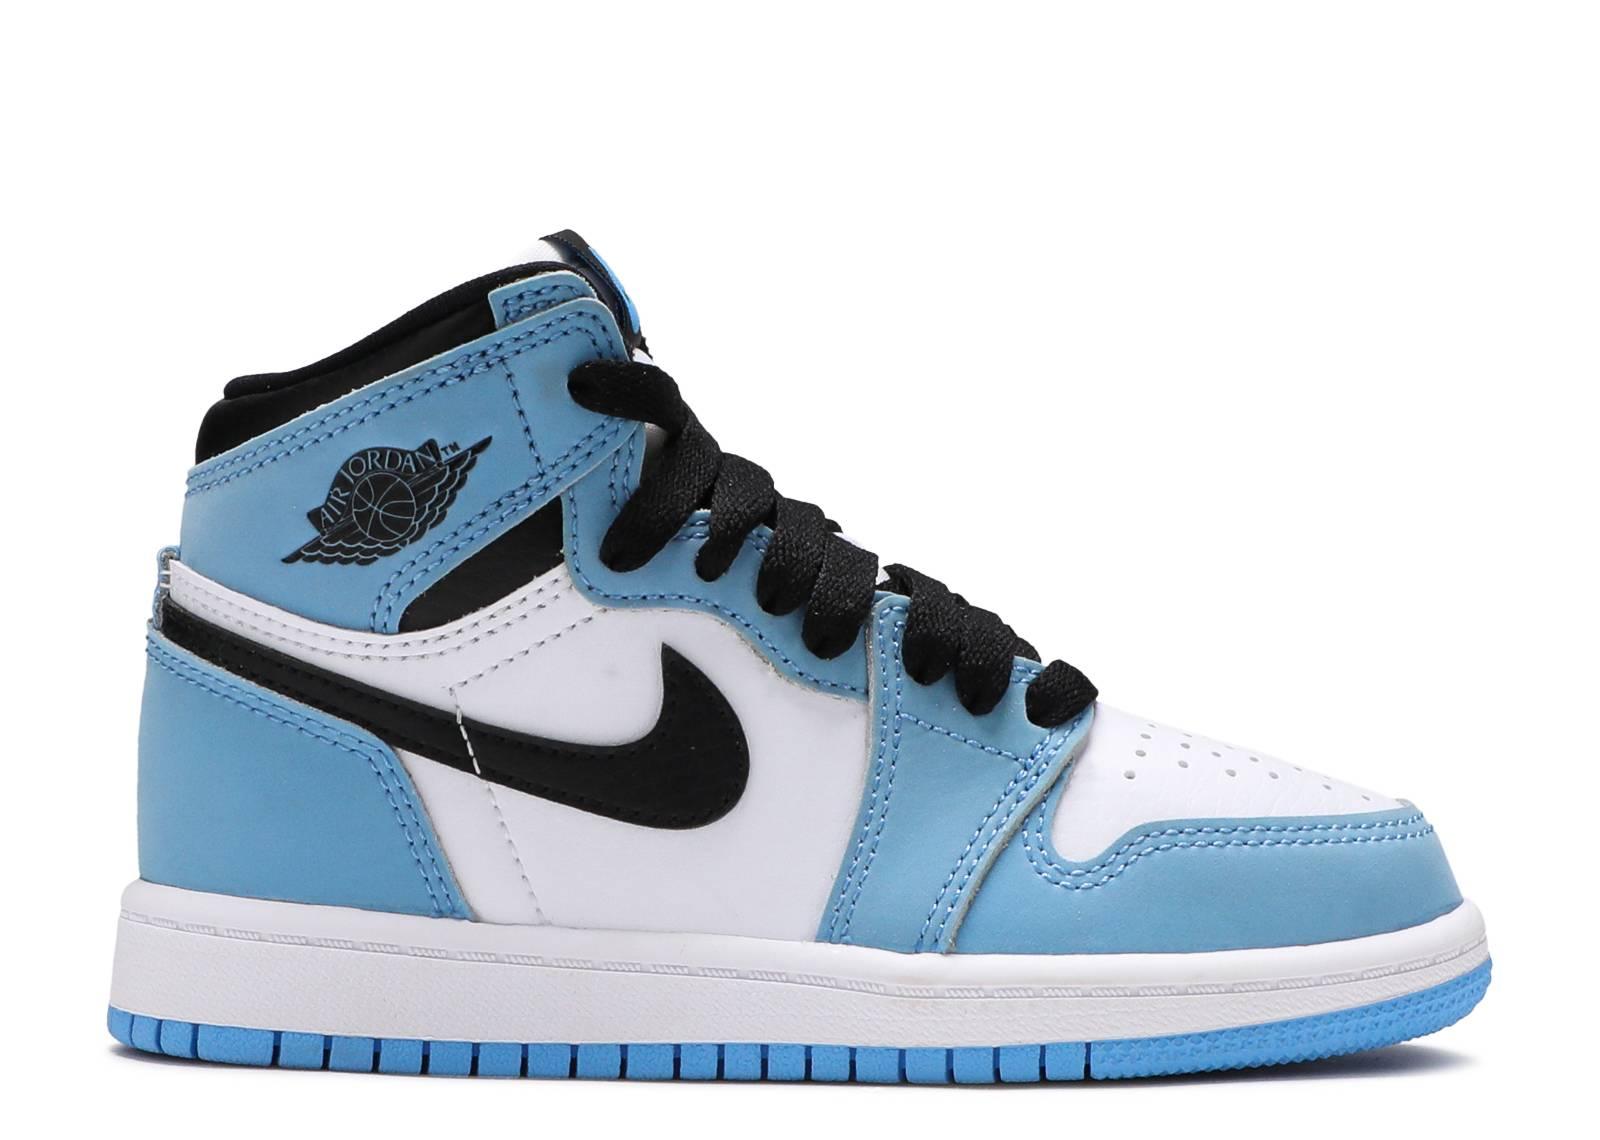 Girls Air Jordan Sneakers | Flight Club